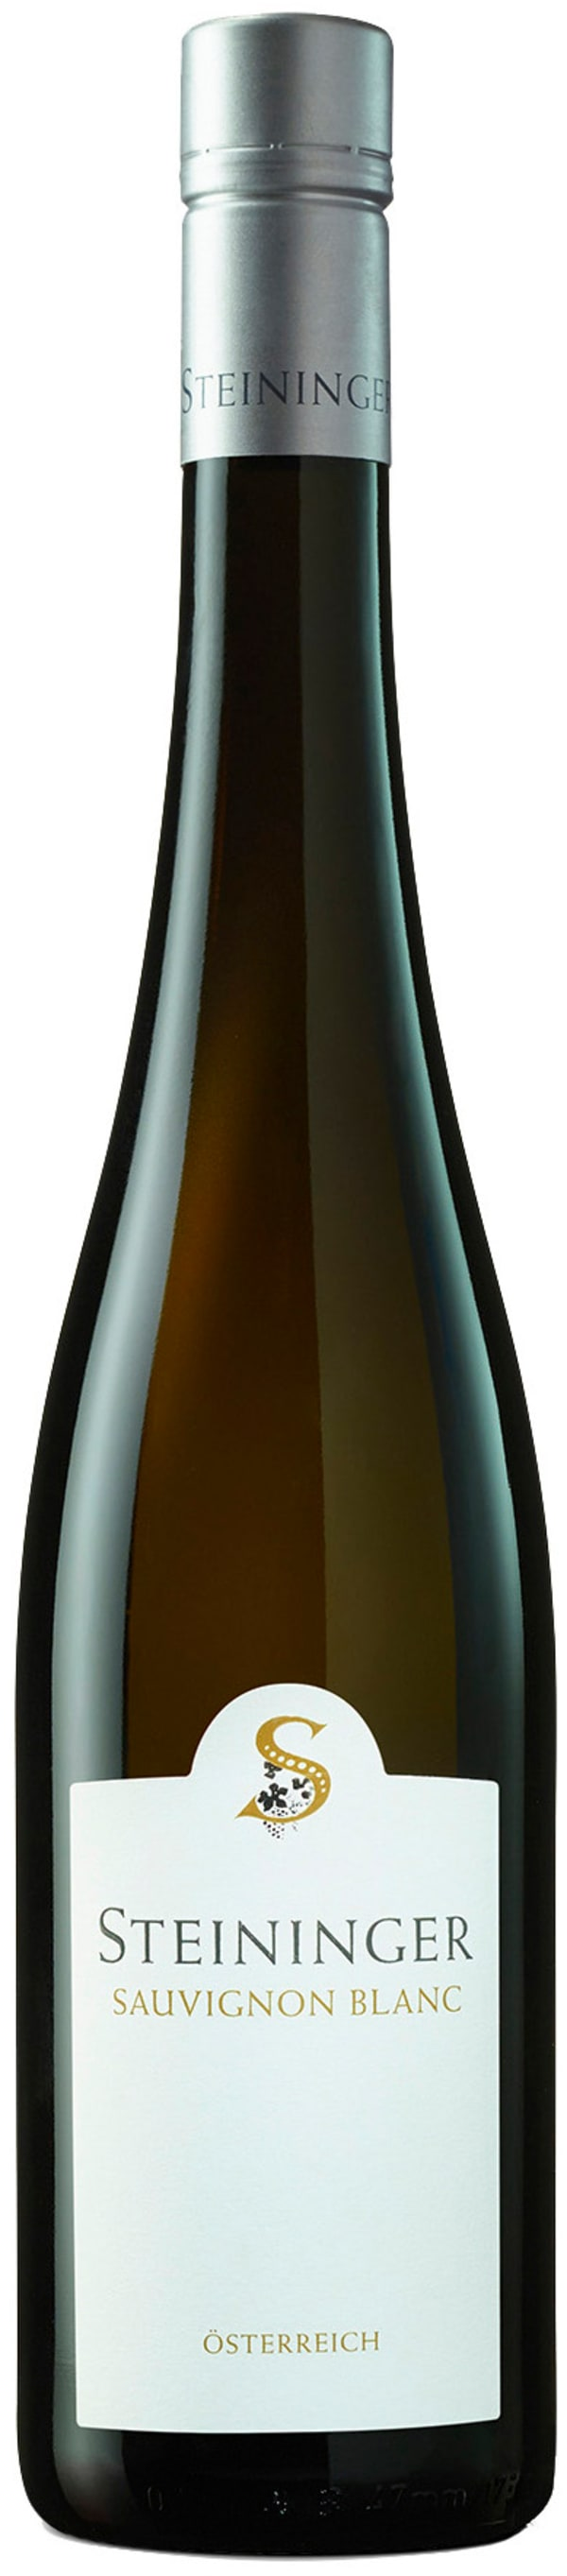 Steininger Sauvignon Blanc 2019